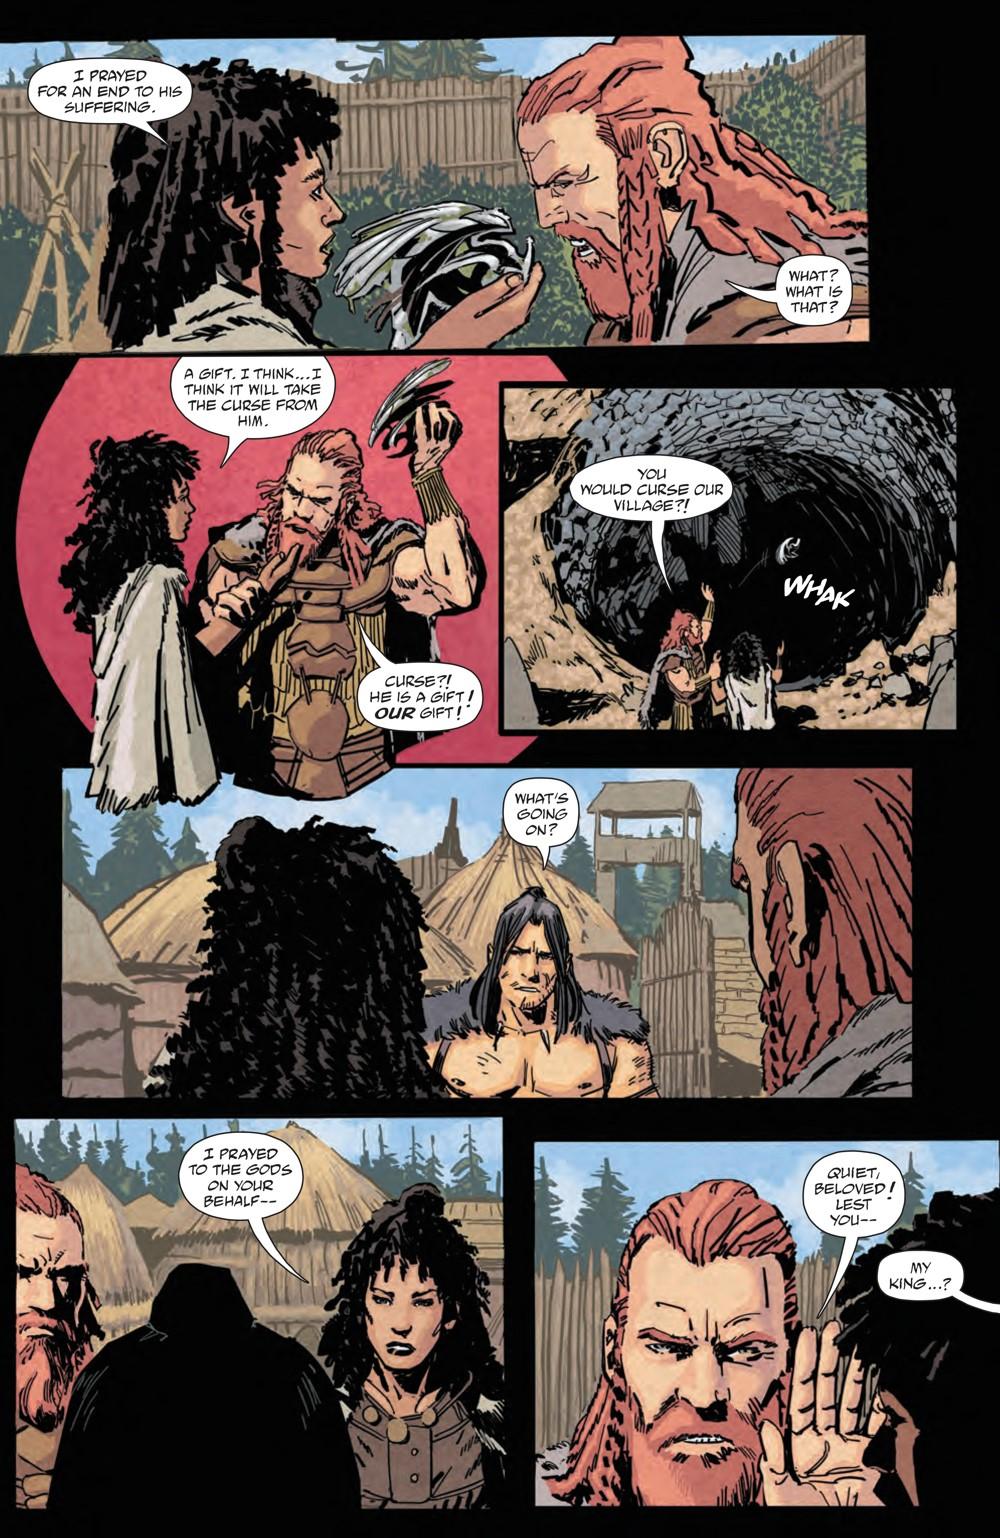 BRZRKR_004_PRESS_5 ComicList Previews: BRZRKR #4 (OF 12)